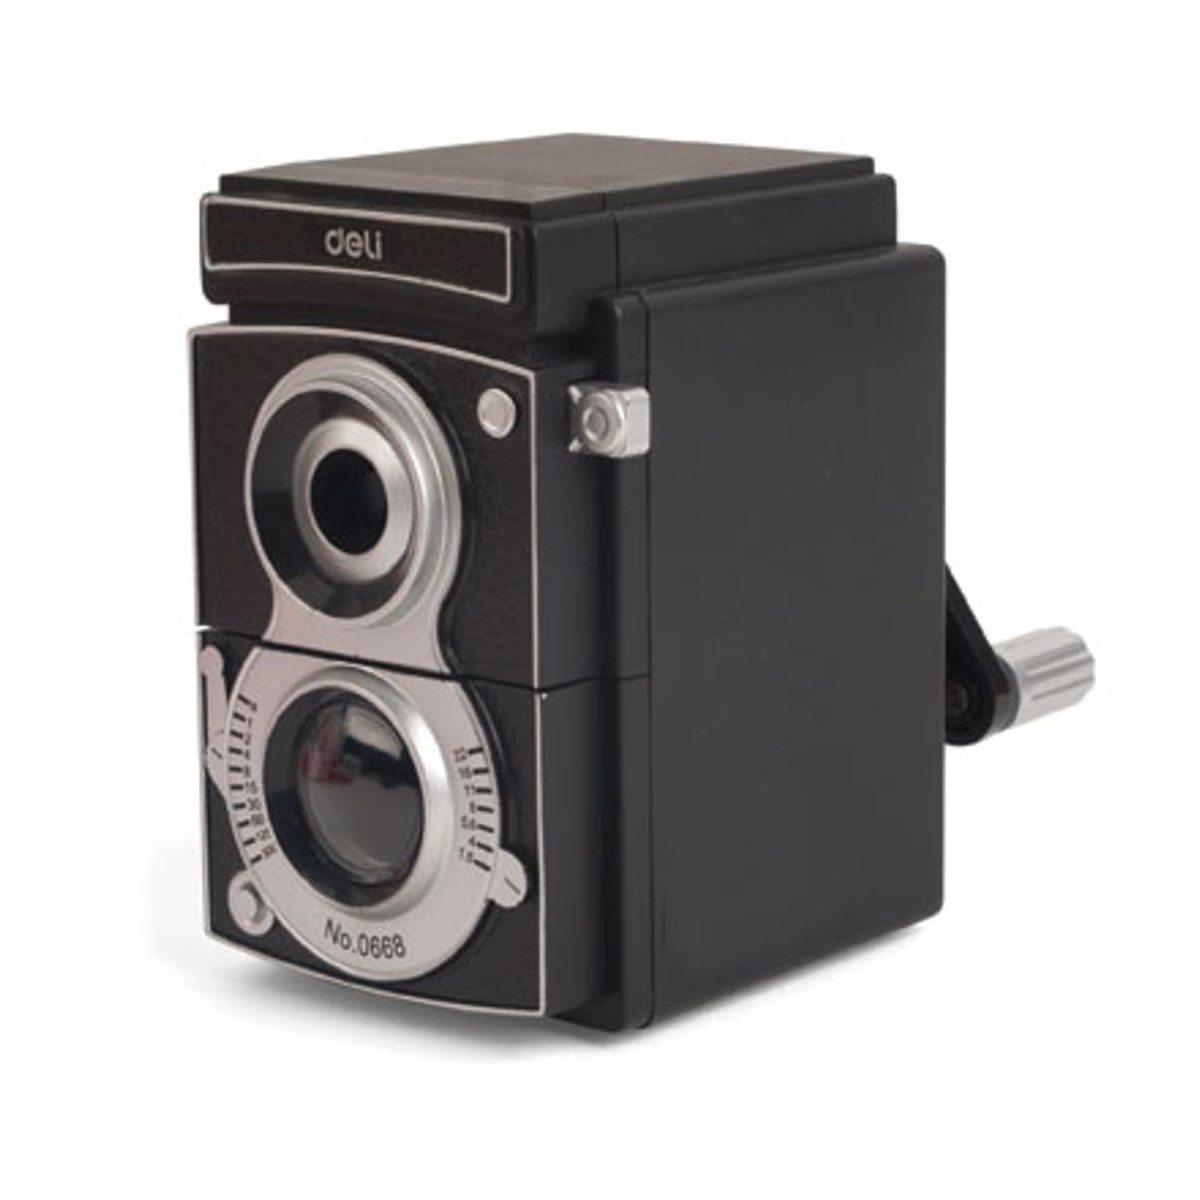 Blyantspidser formet som et gammeldags kamera